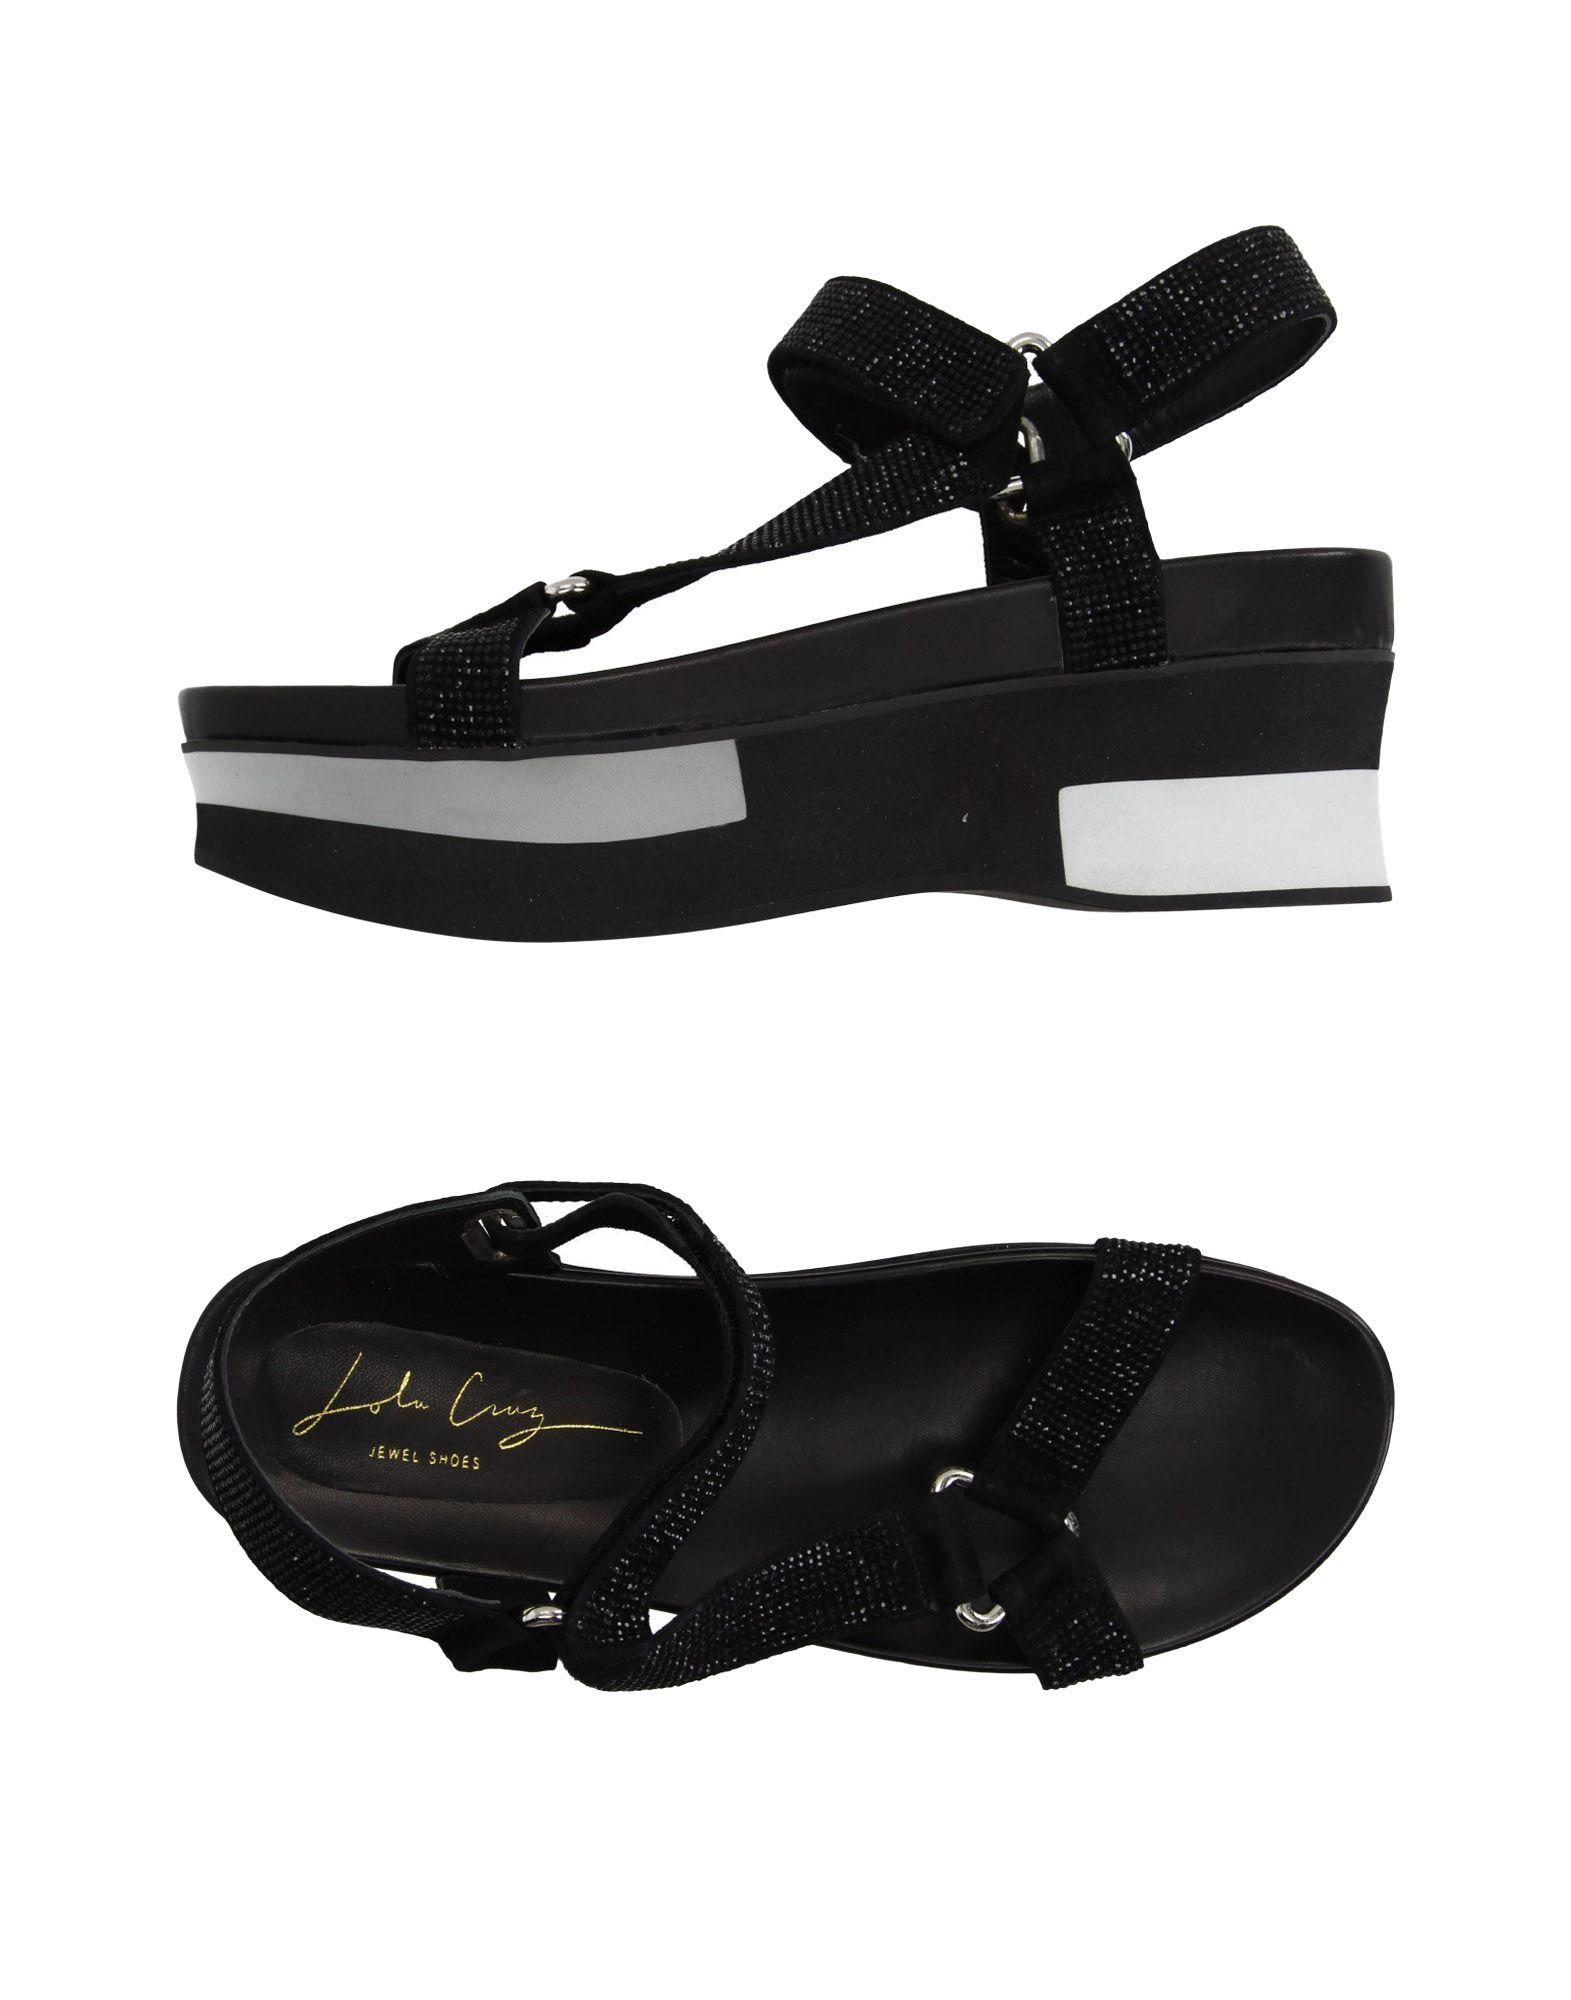 Where To Buy Lola Cruz Shoes